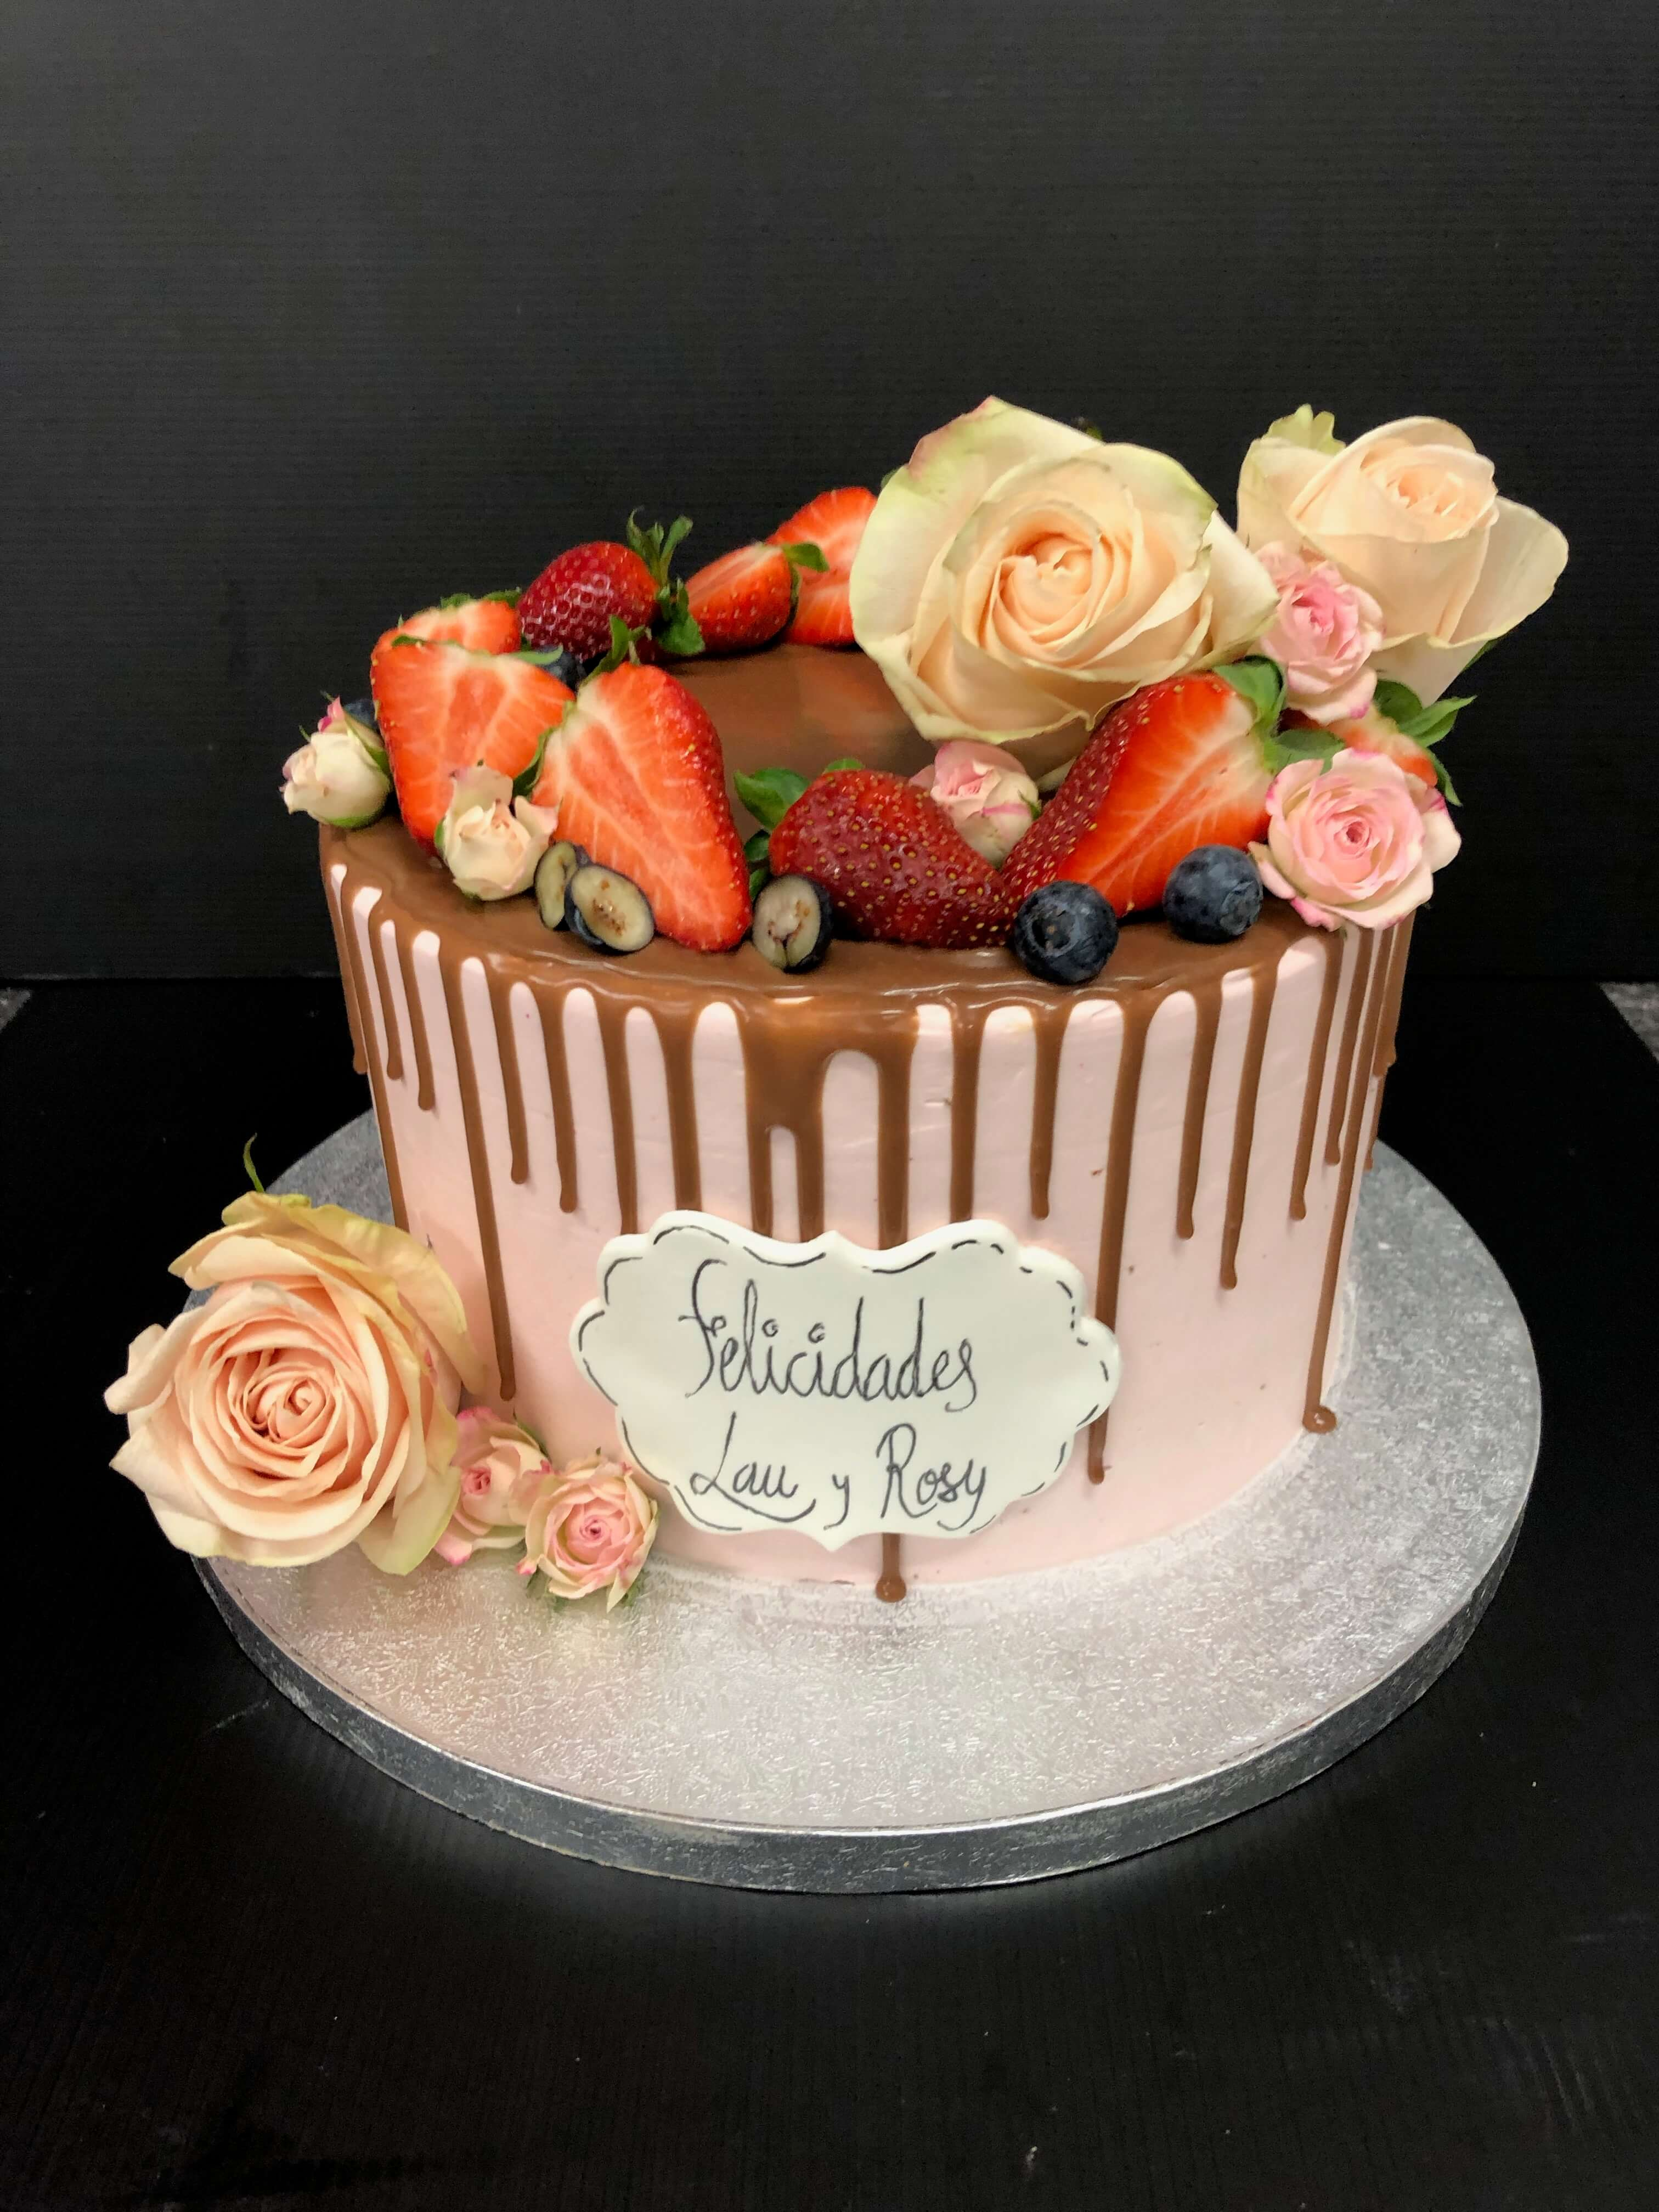 tarta aniversario  boda coruña naked cake tarta boda desnuda coruña tarta boda